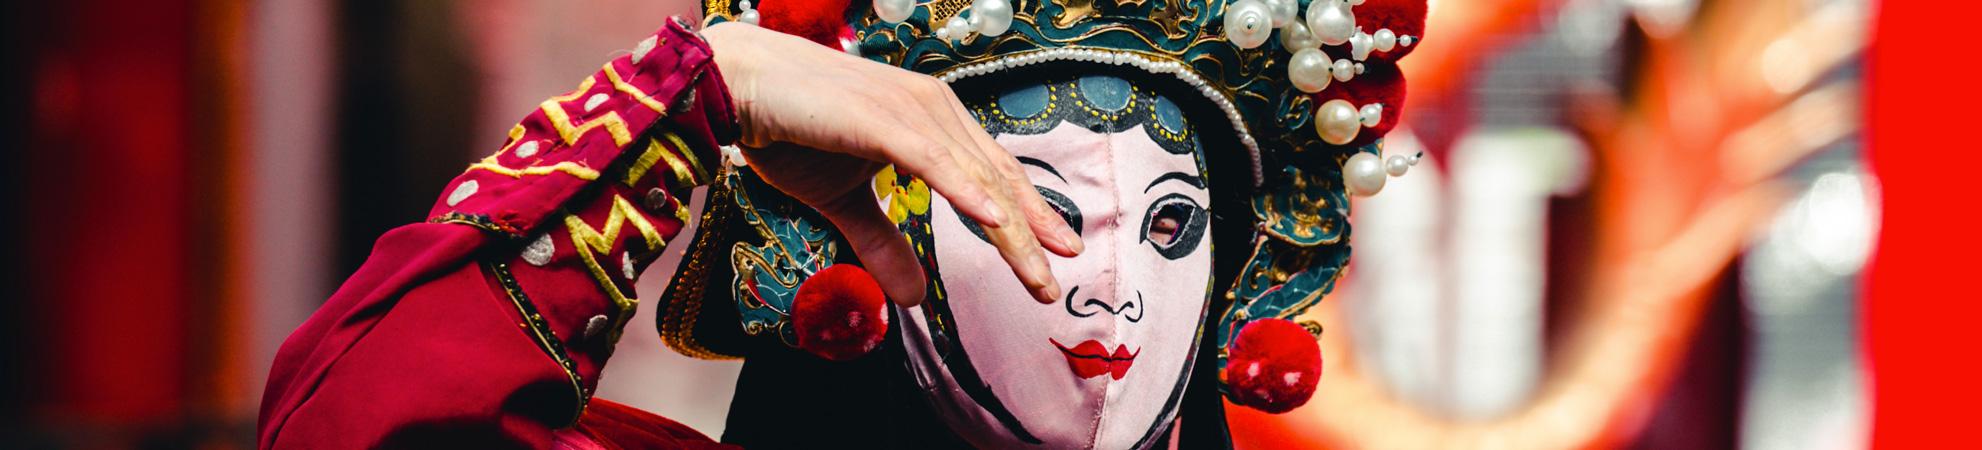 Tradition et artisanat en Chine